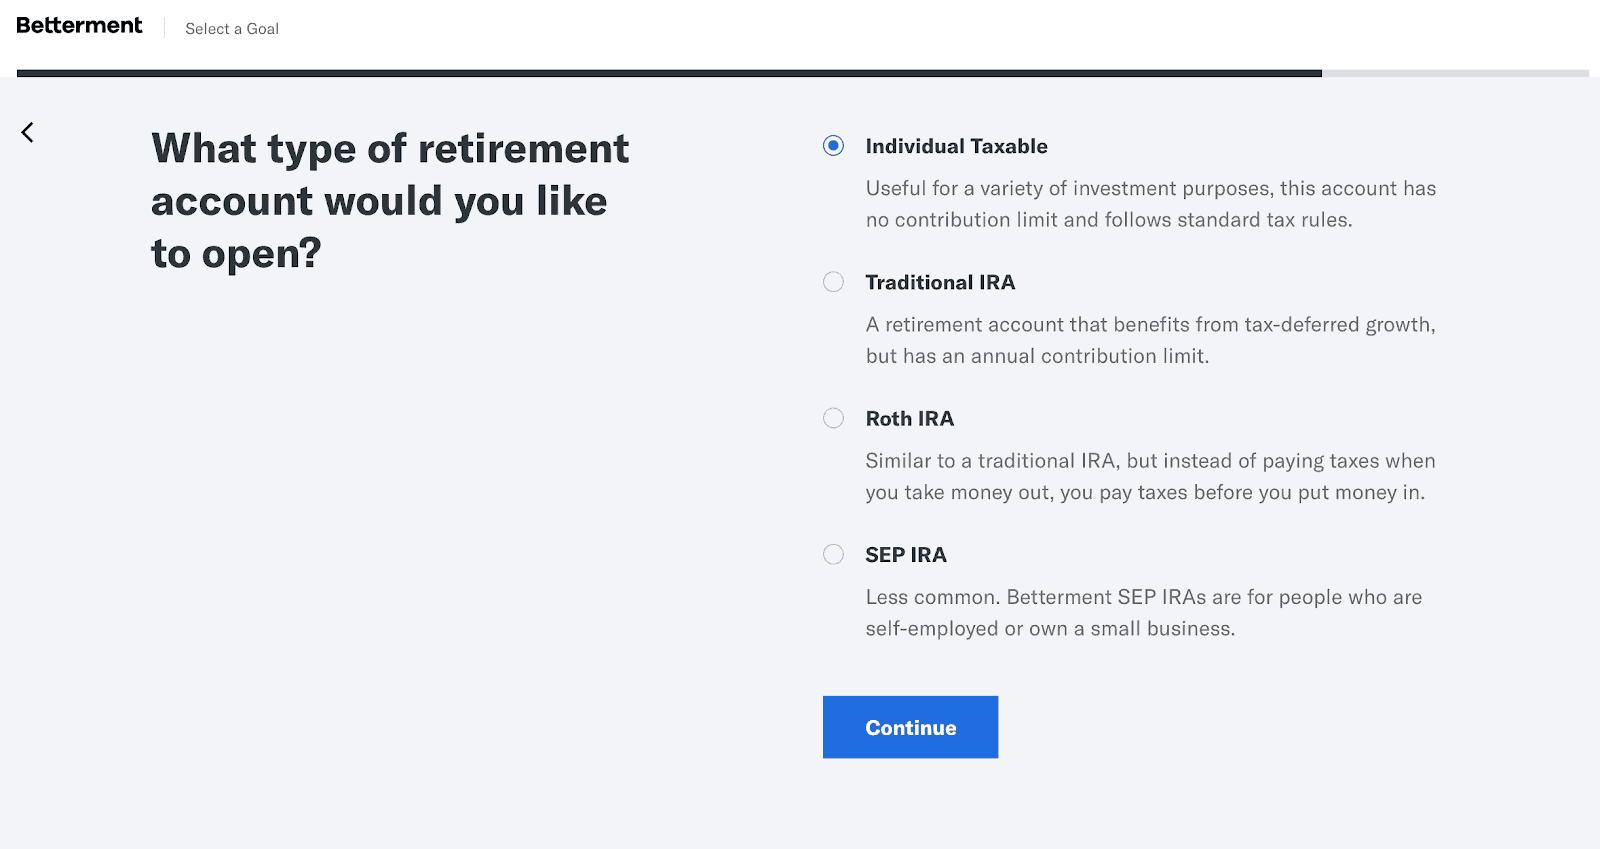 Betterment - Retirement Account Options